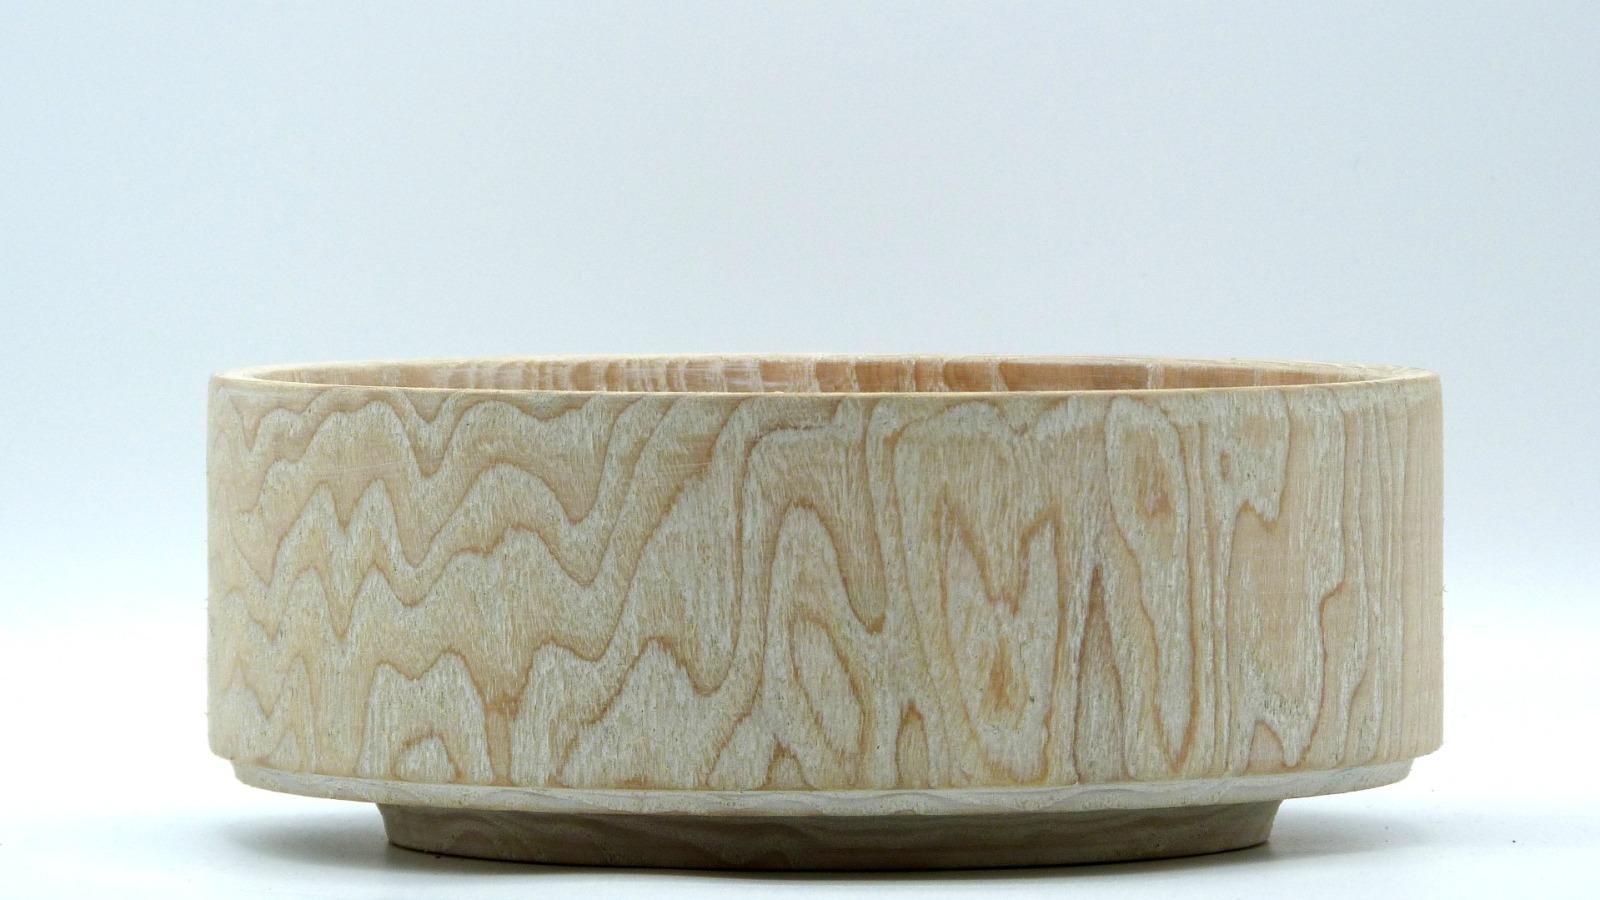 Holzschale weiß aus Lindenholz 2